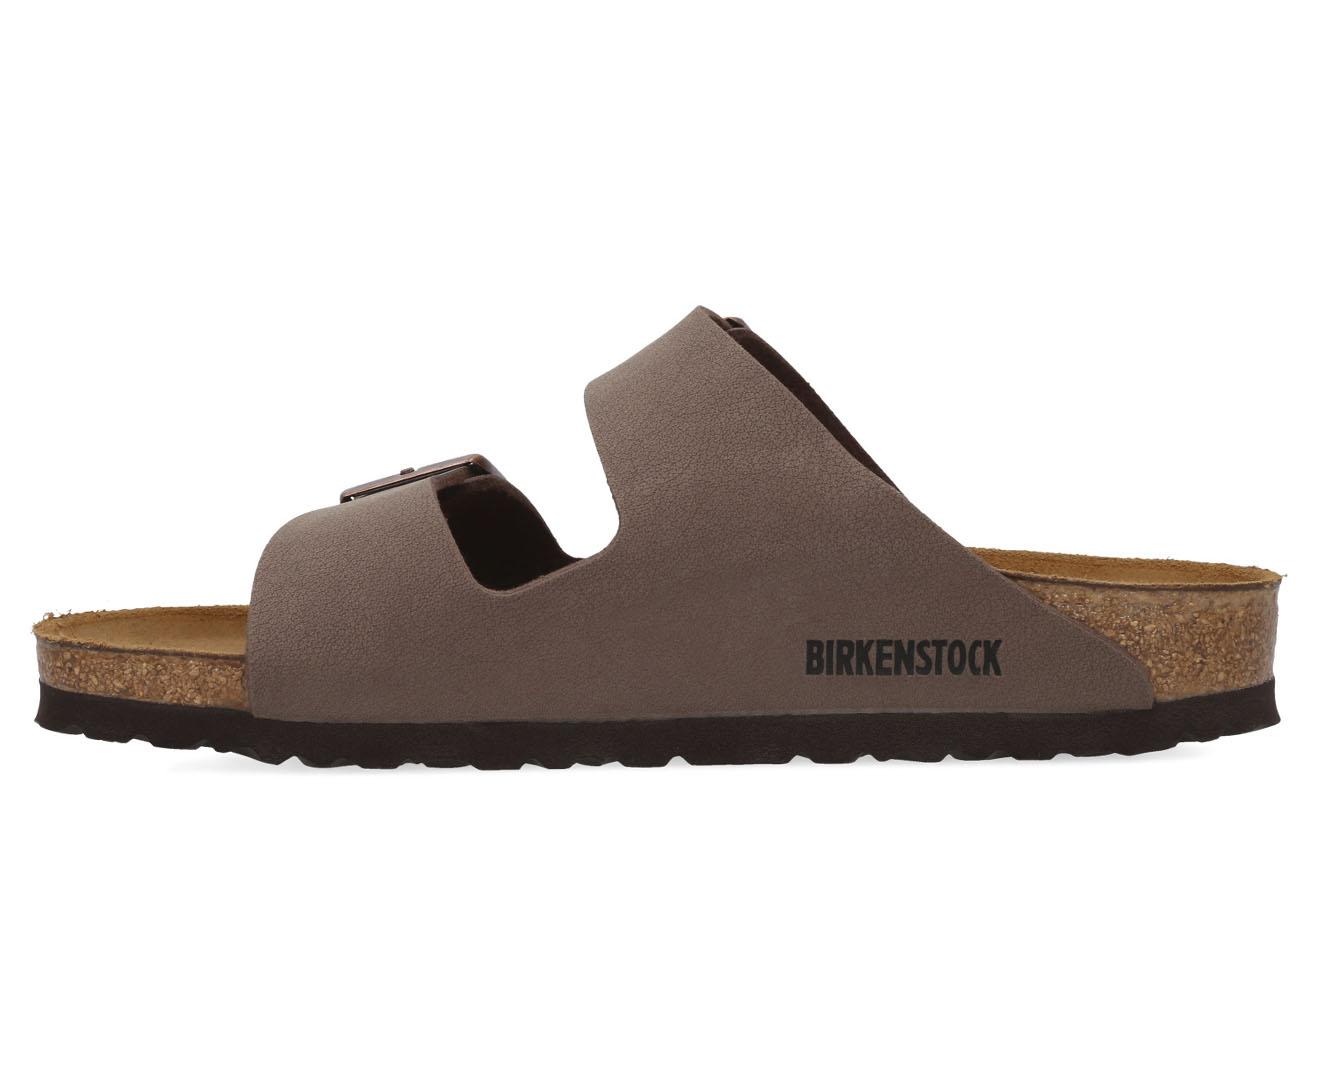 Birkenstock Arizona Birko-Flor Narrow